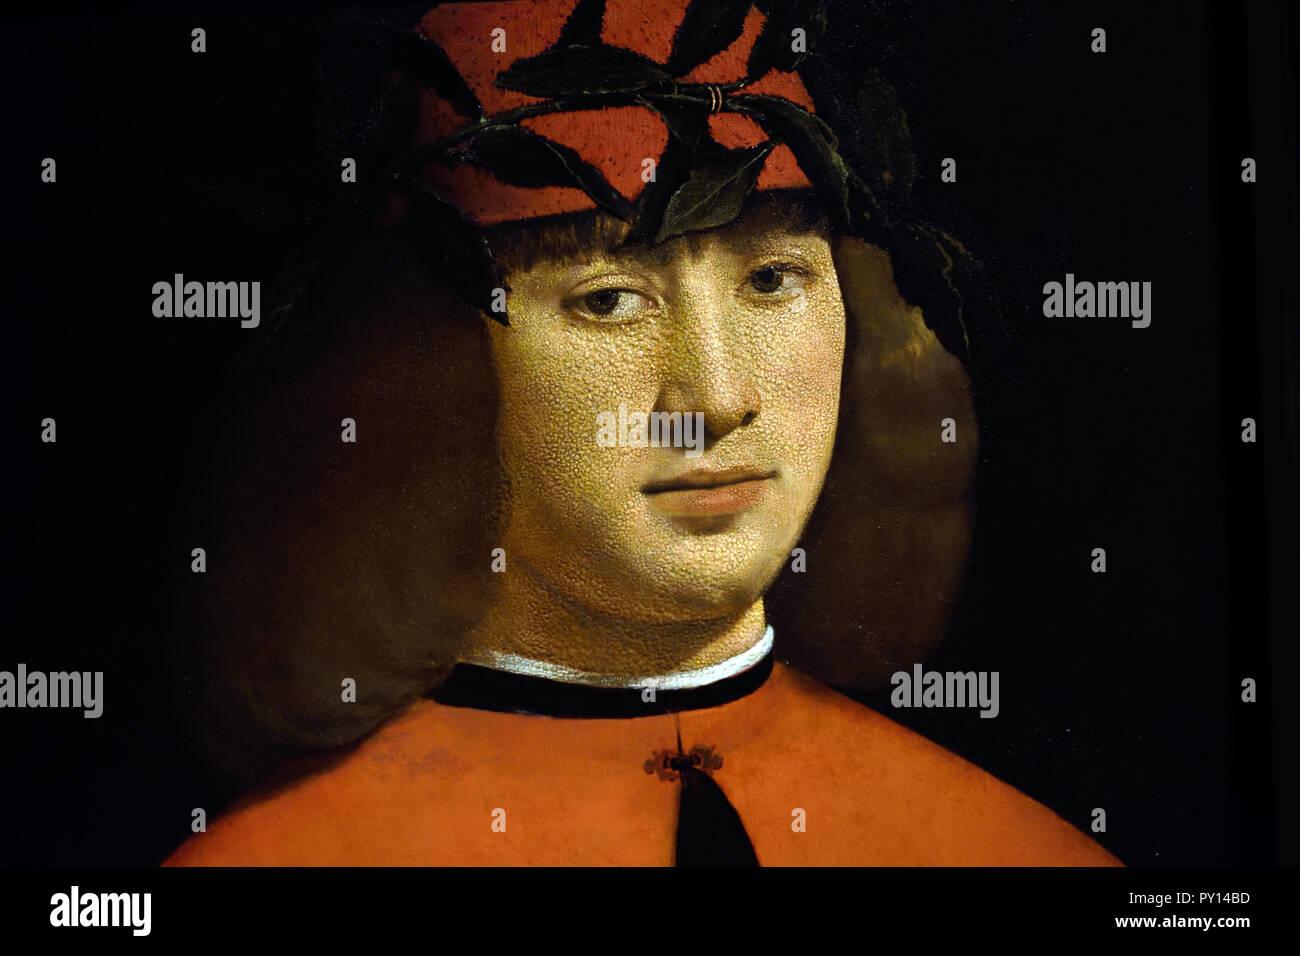 Portrait of the Poet Gerolamo Casio 1490 - 1500 by Giovanni Antonio Boltraffio 15th Century, Italy, Italian. - Stock Image